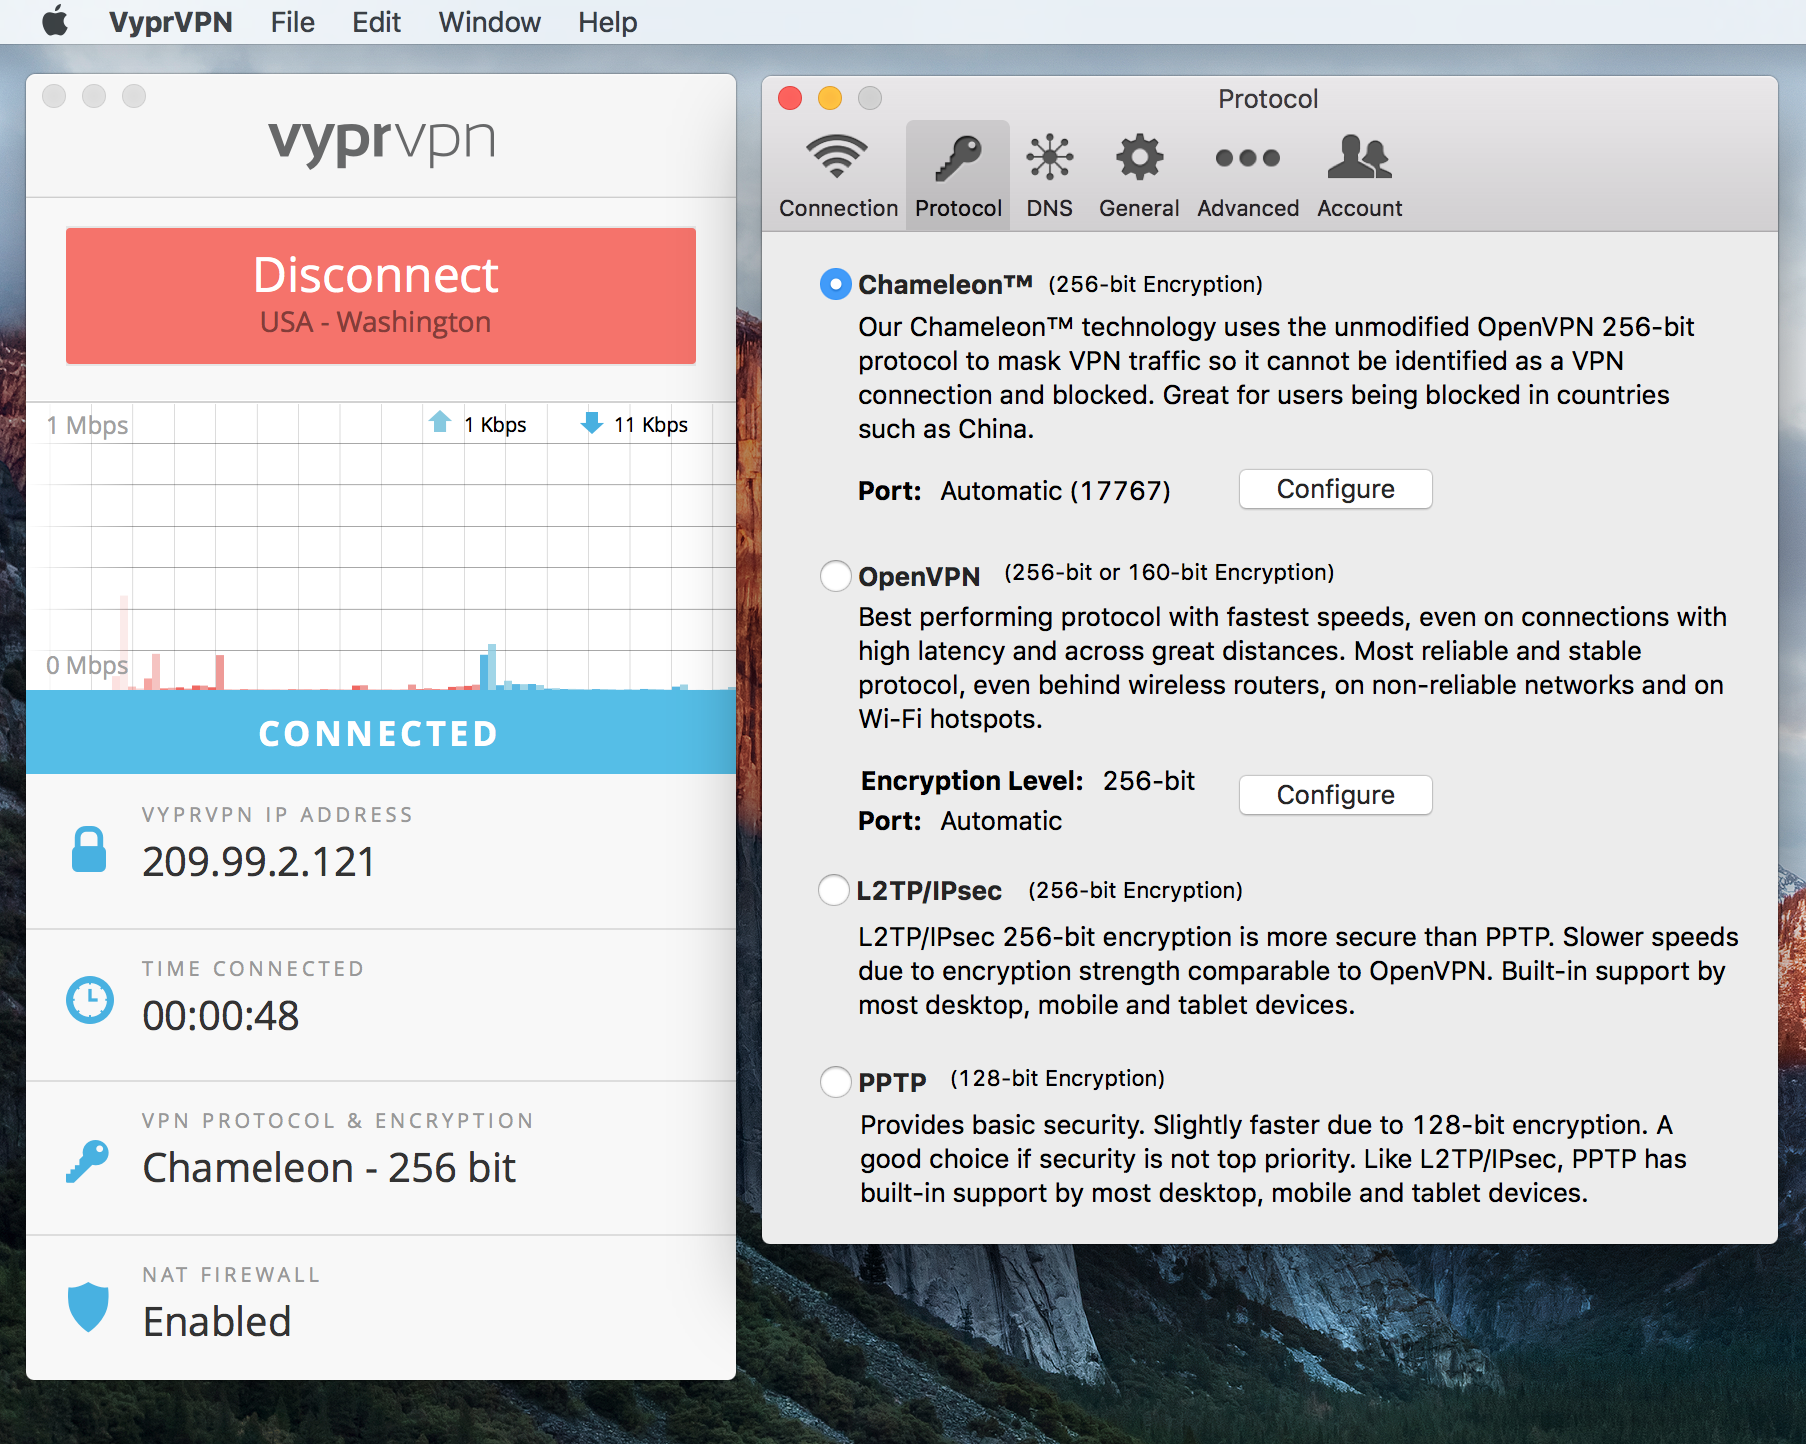 Windows 10 setting up a vpn